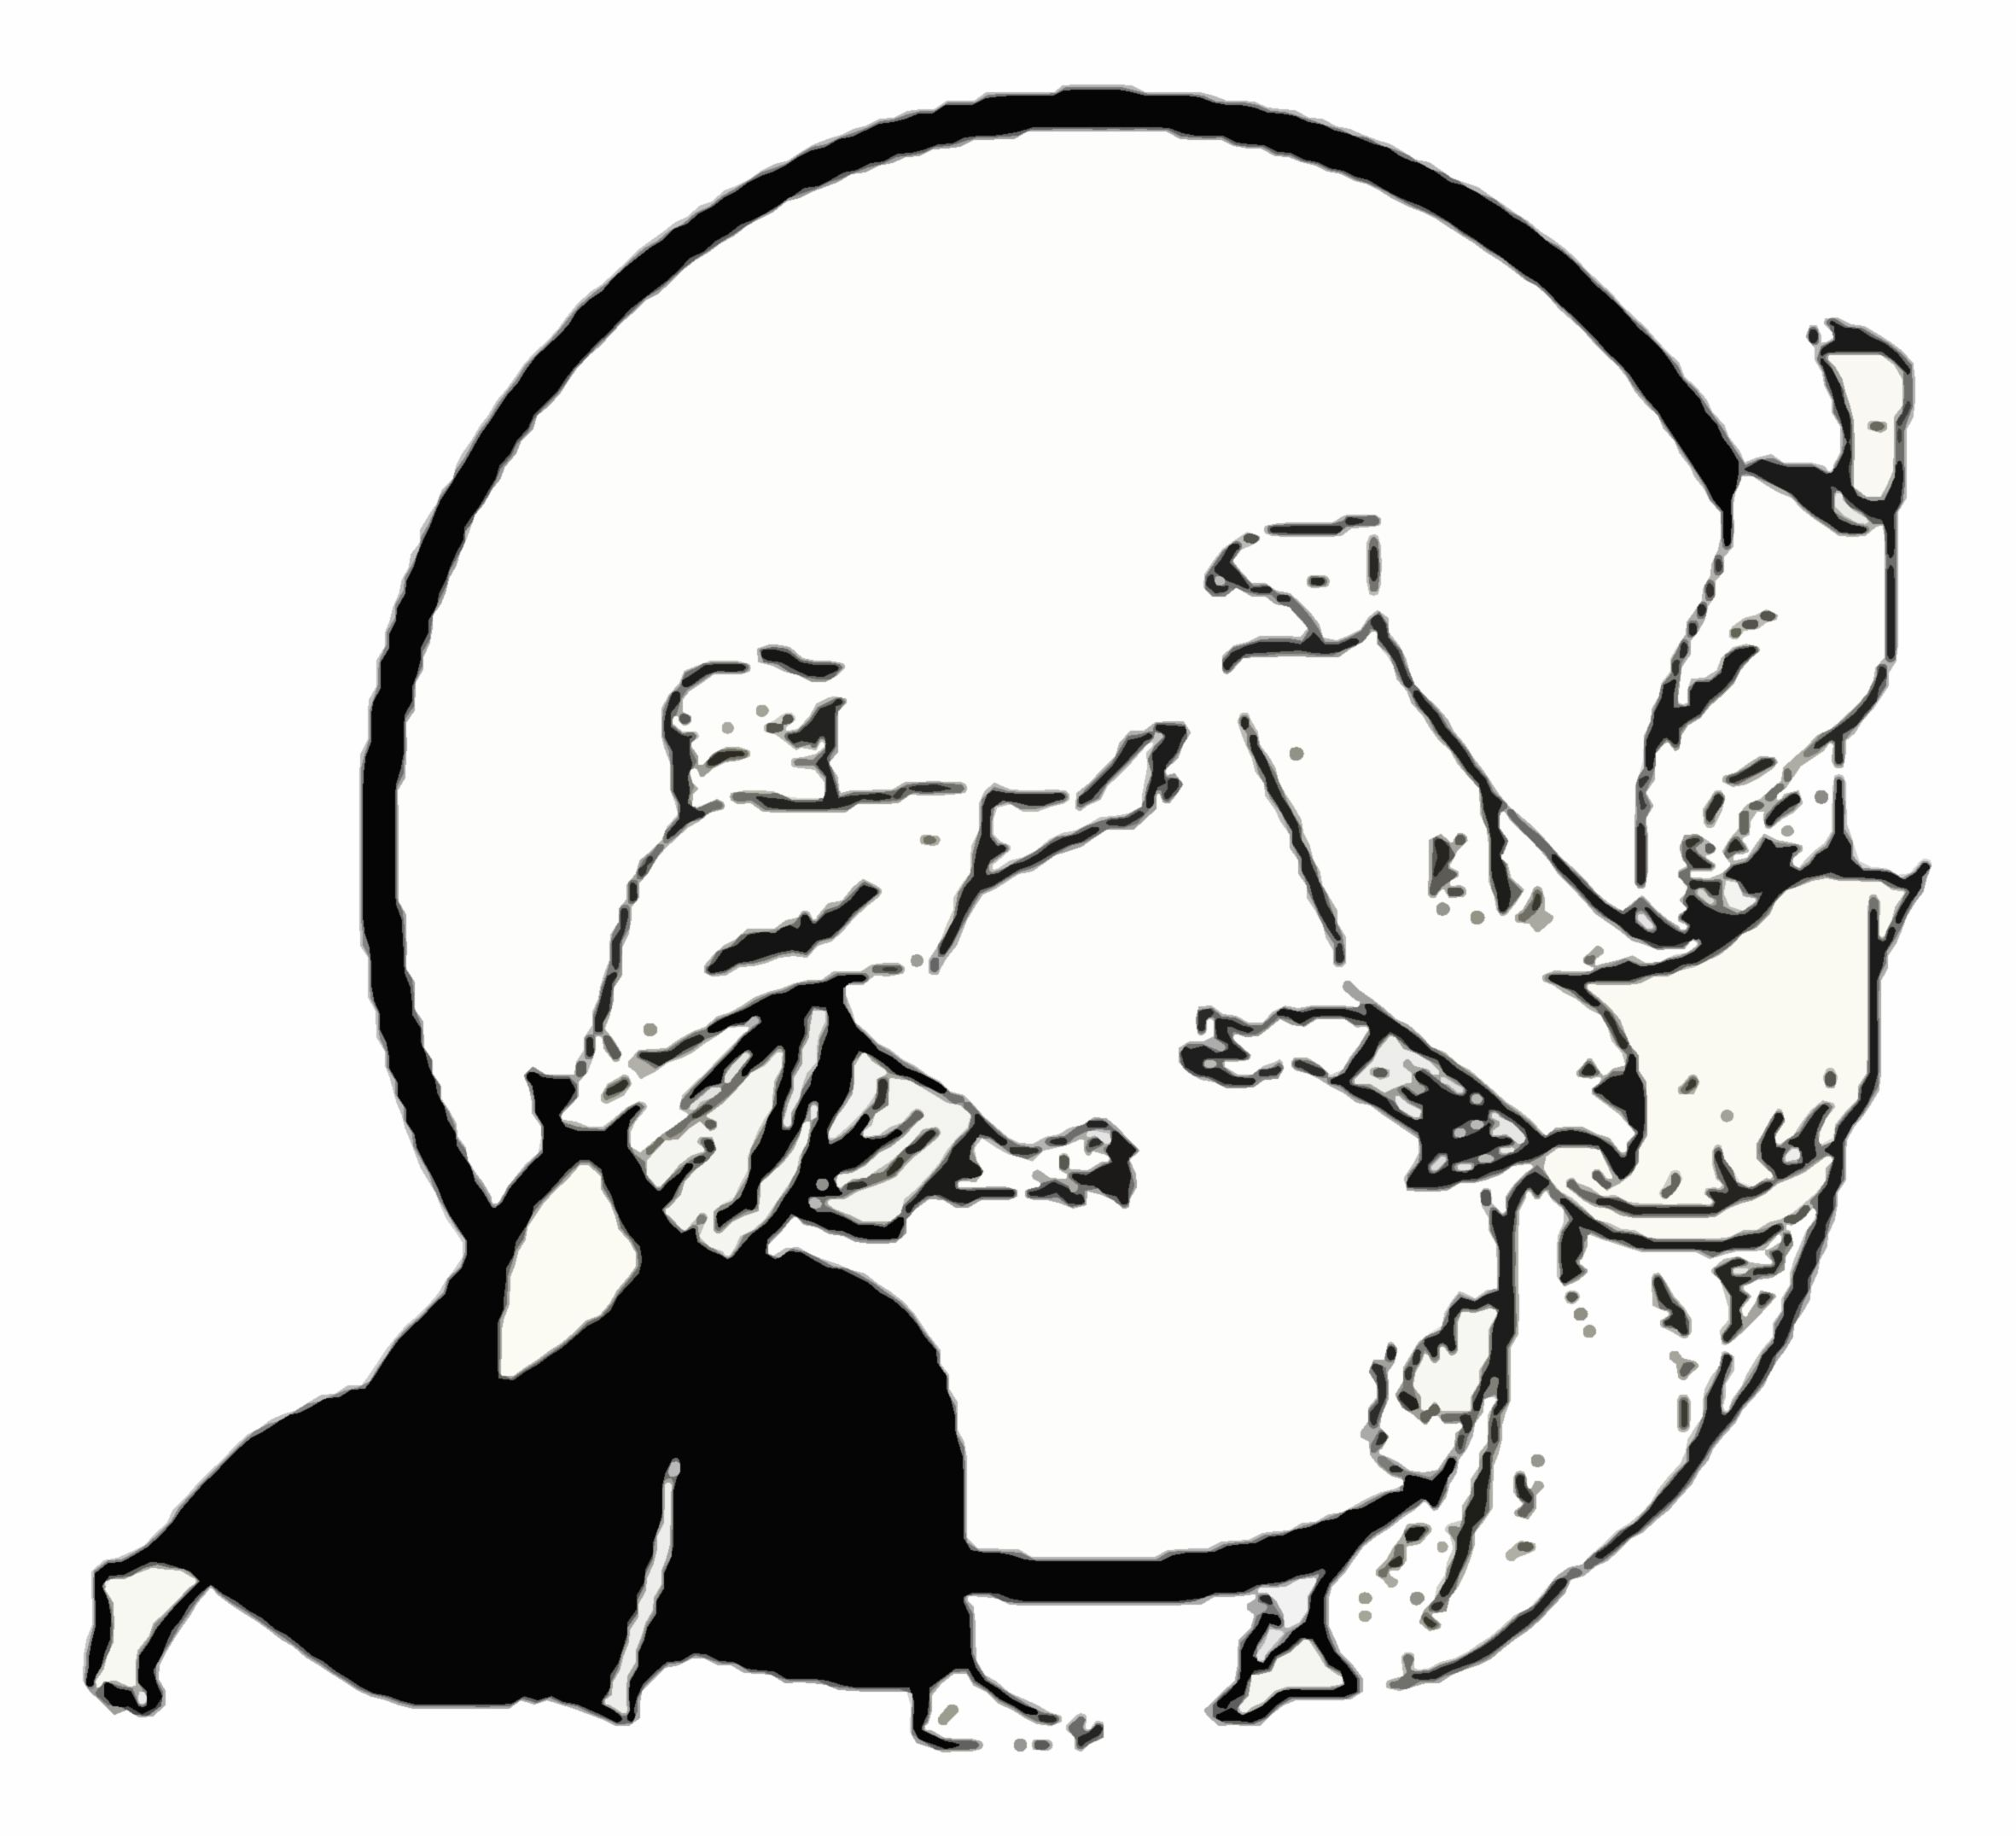 Part of the sports development zone aikido aikido